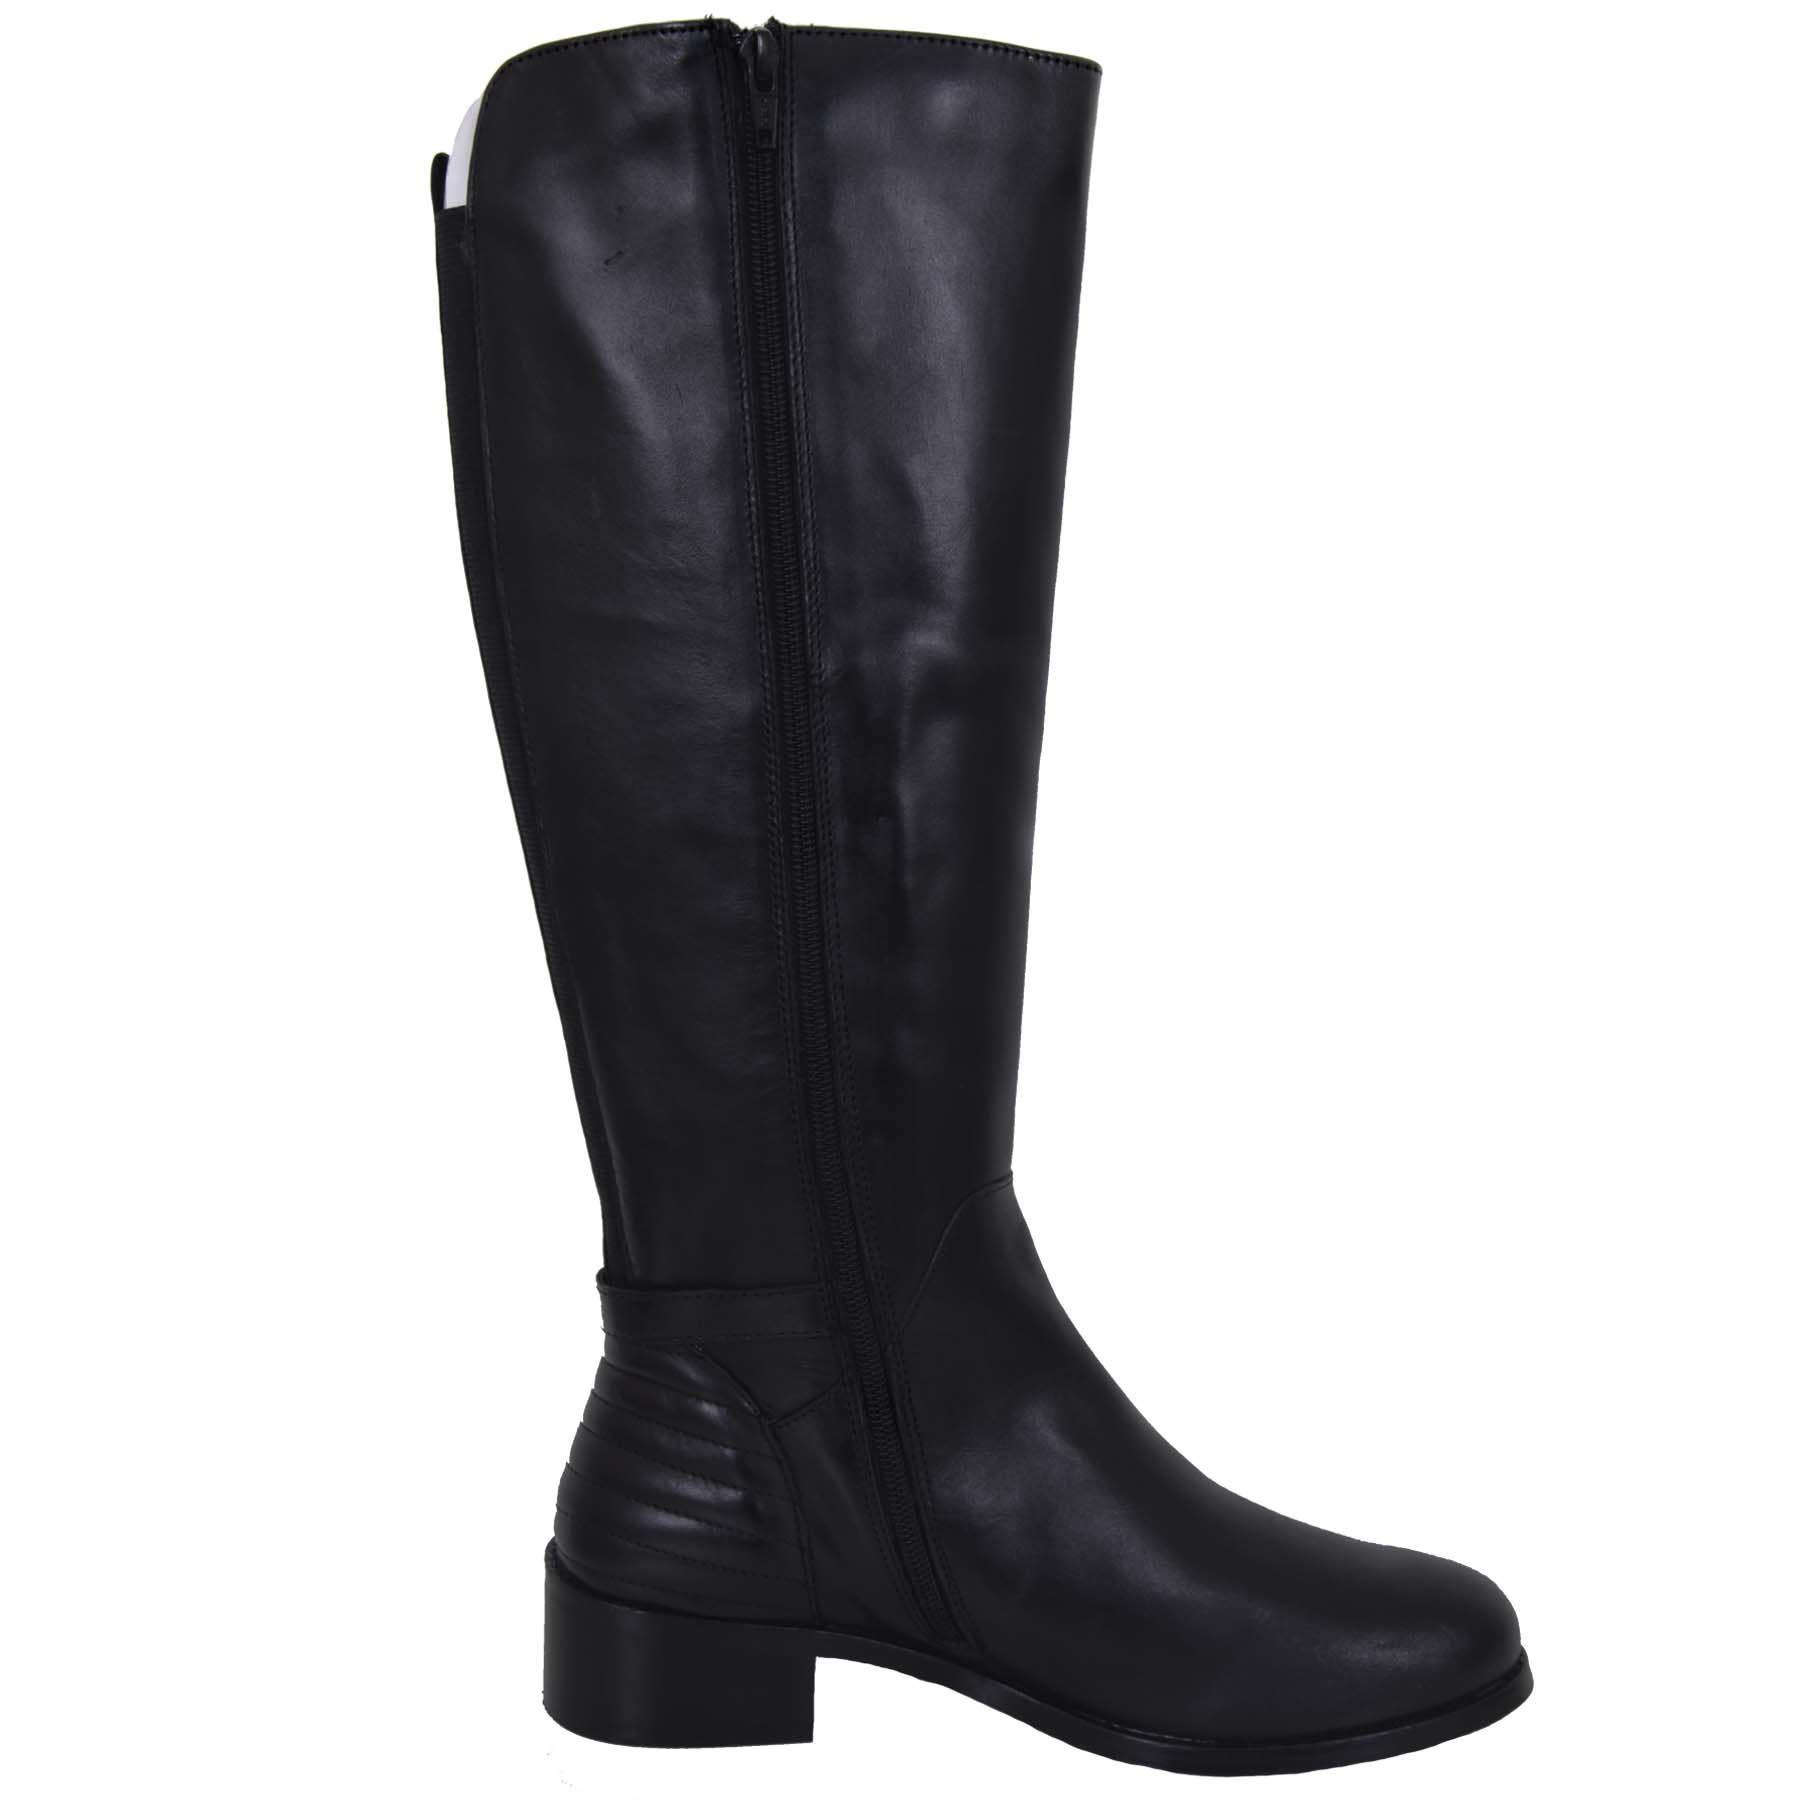 GLH472 Reschwarz Reschwarz Reschwarz Zipper Side Calf High Low Heel Elasticated Genuine Leather Stiefel 73fad2